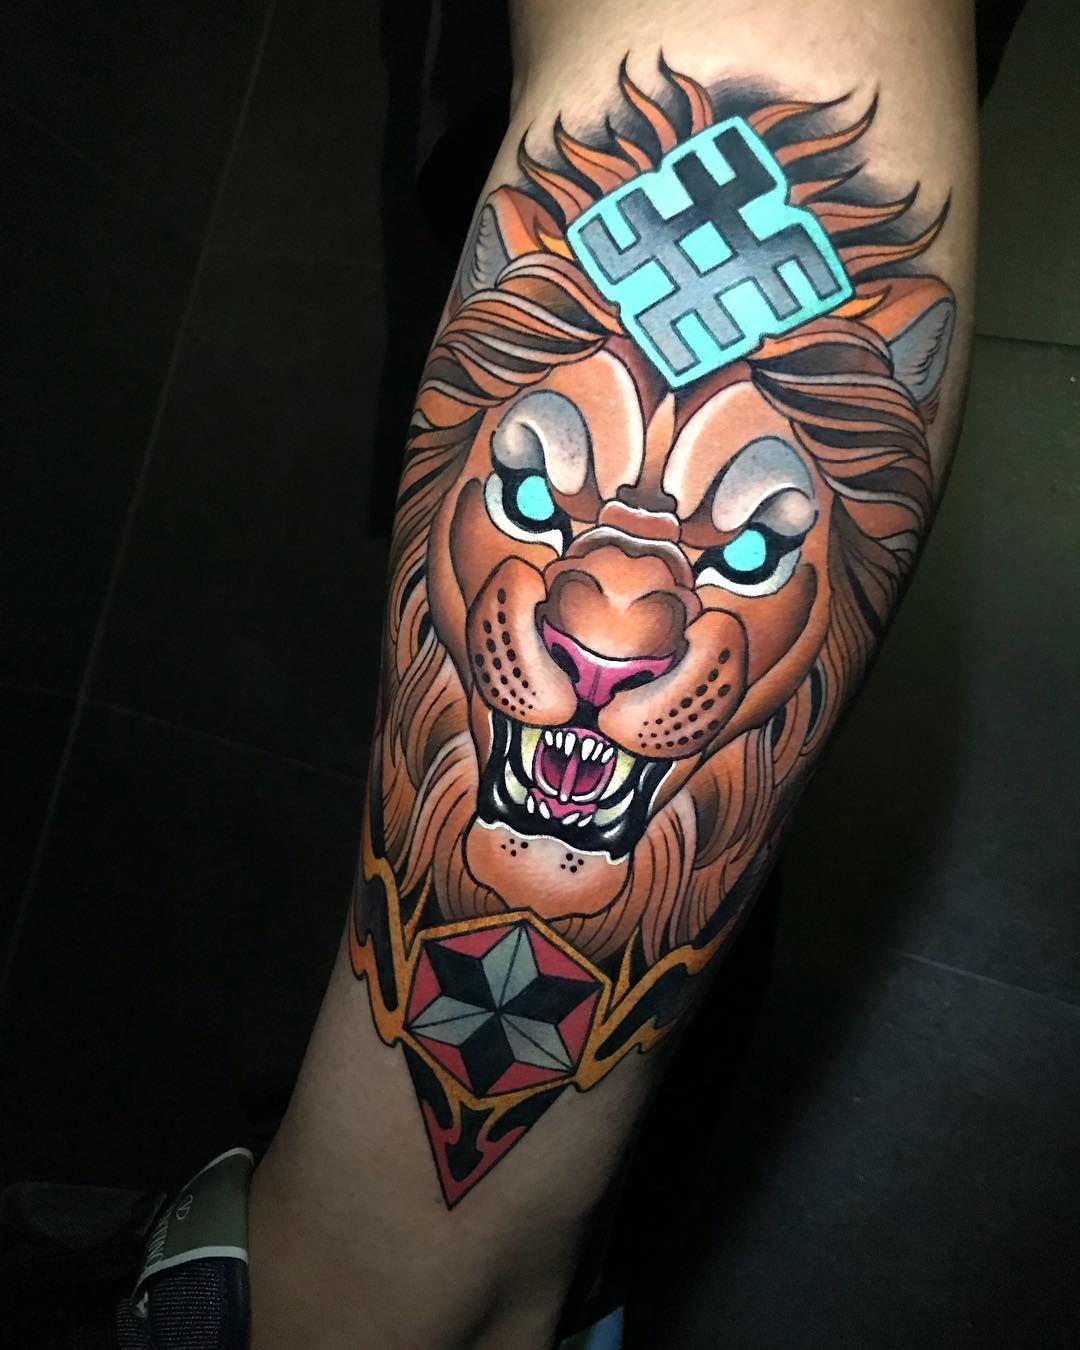 Tattoo artist Johnny Domus Mesquita colorfull neo traditional ... - Tattoo Studio Bielefeld